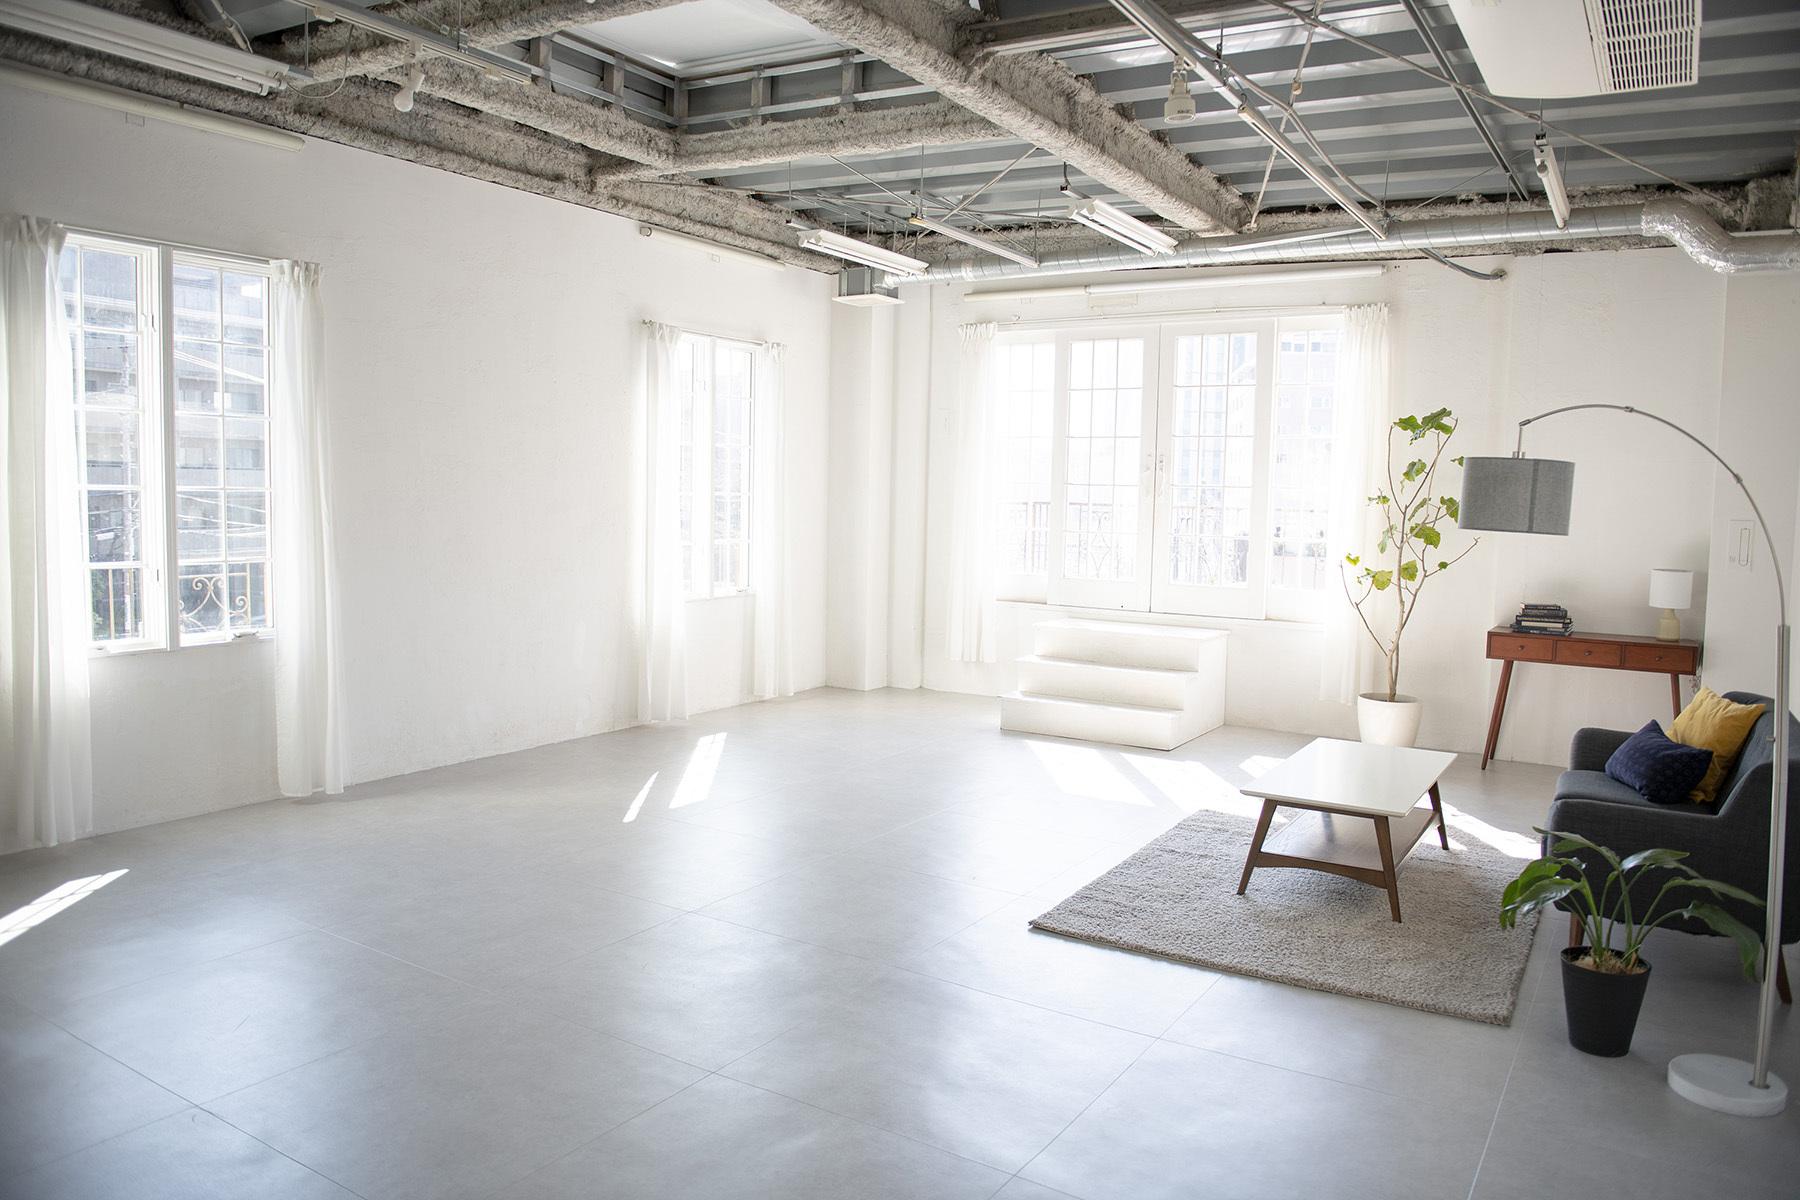 Paris Mansion #301 (パリ マンション)